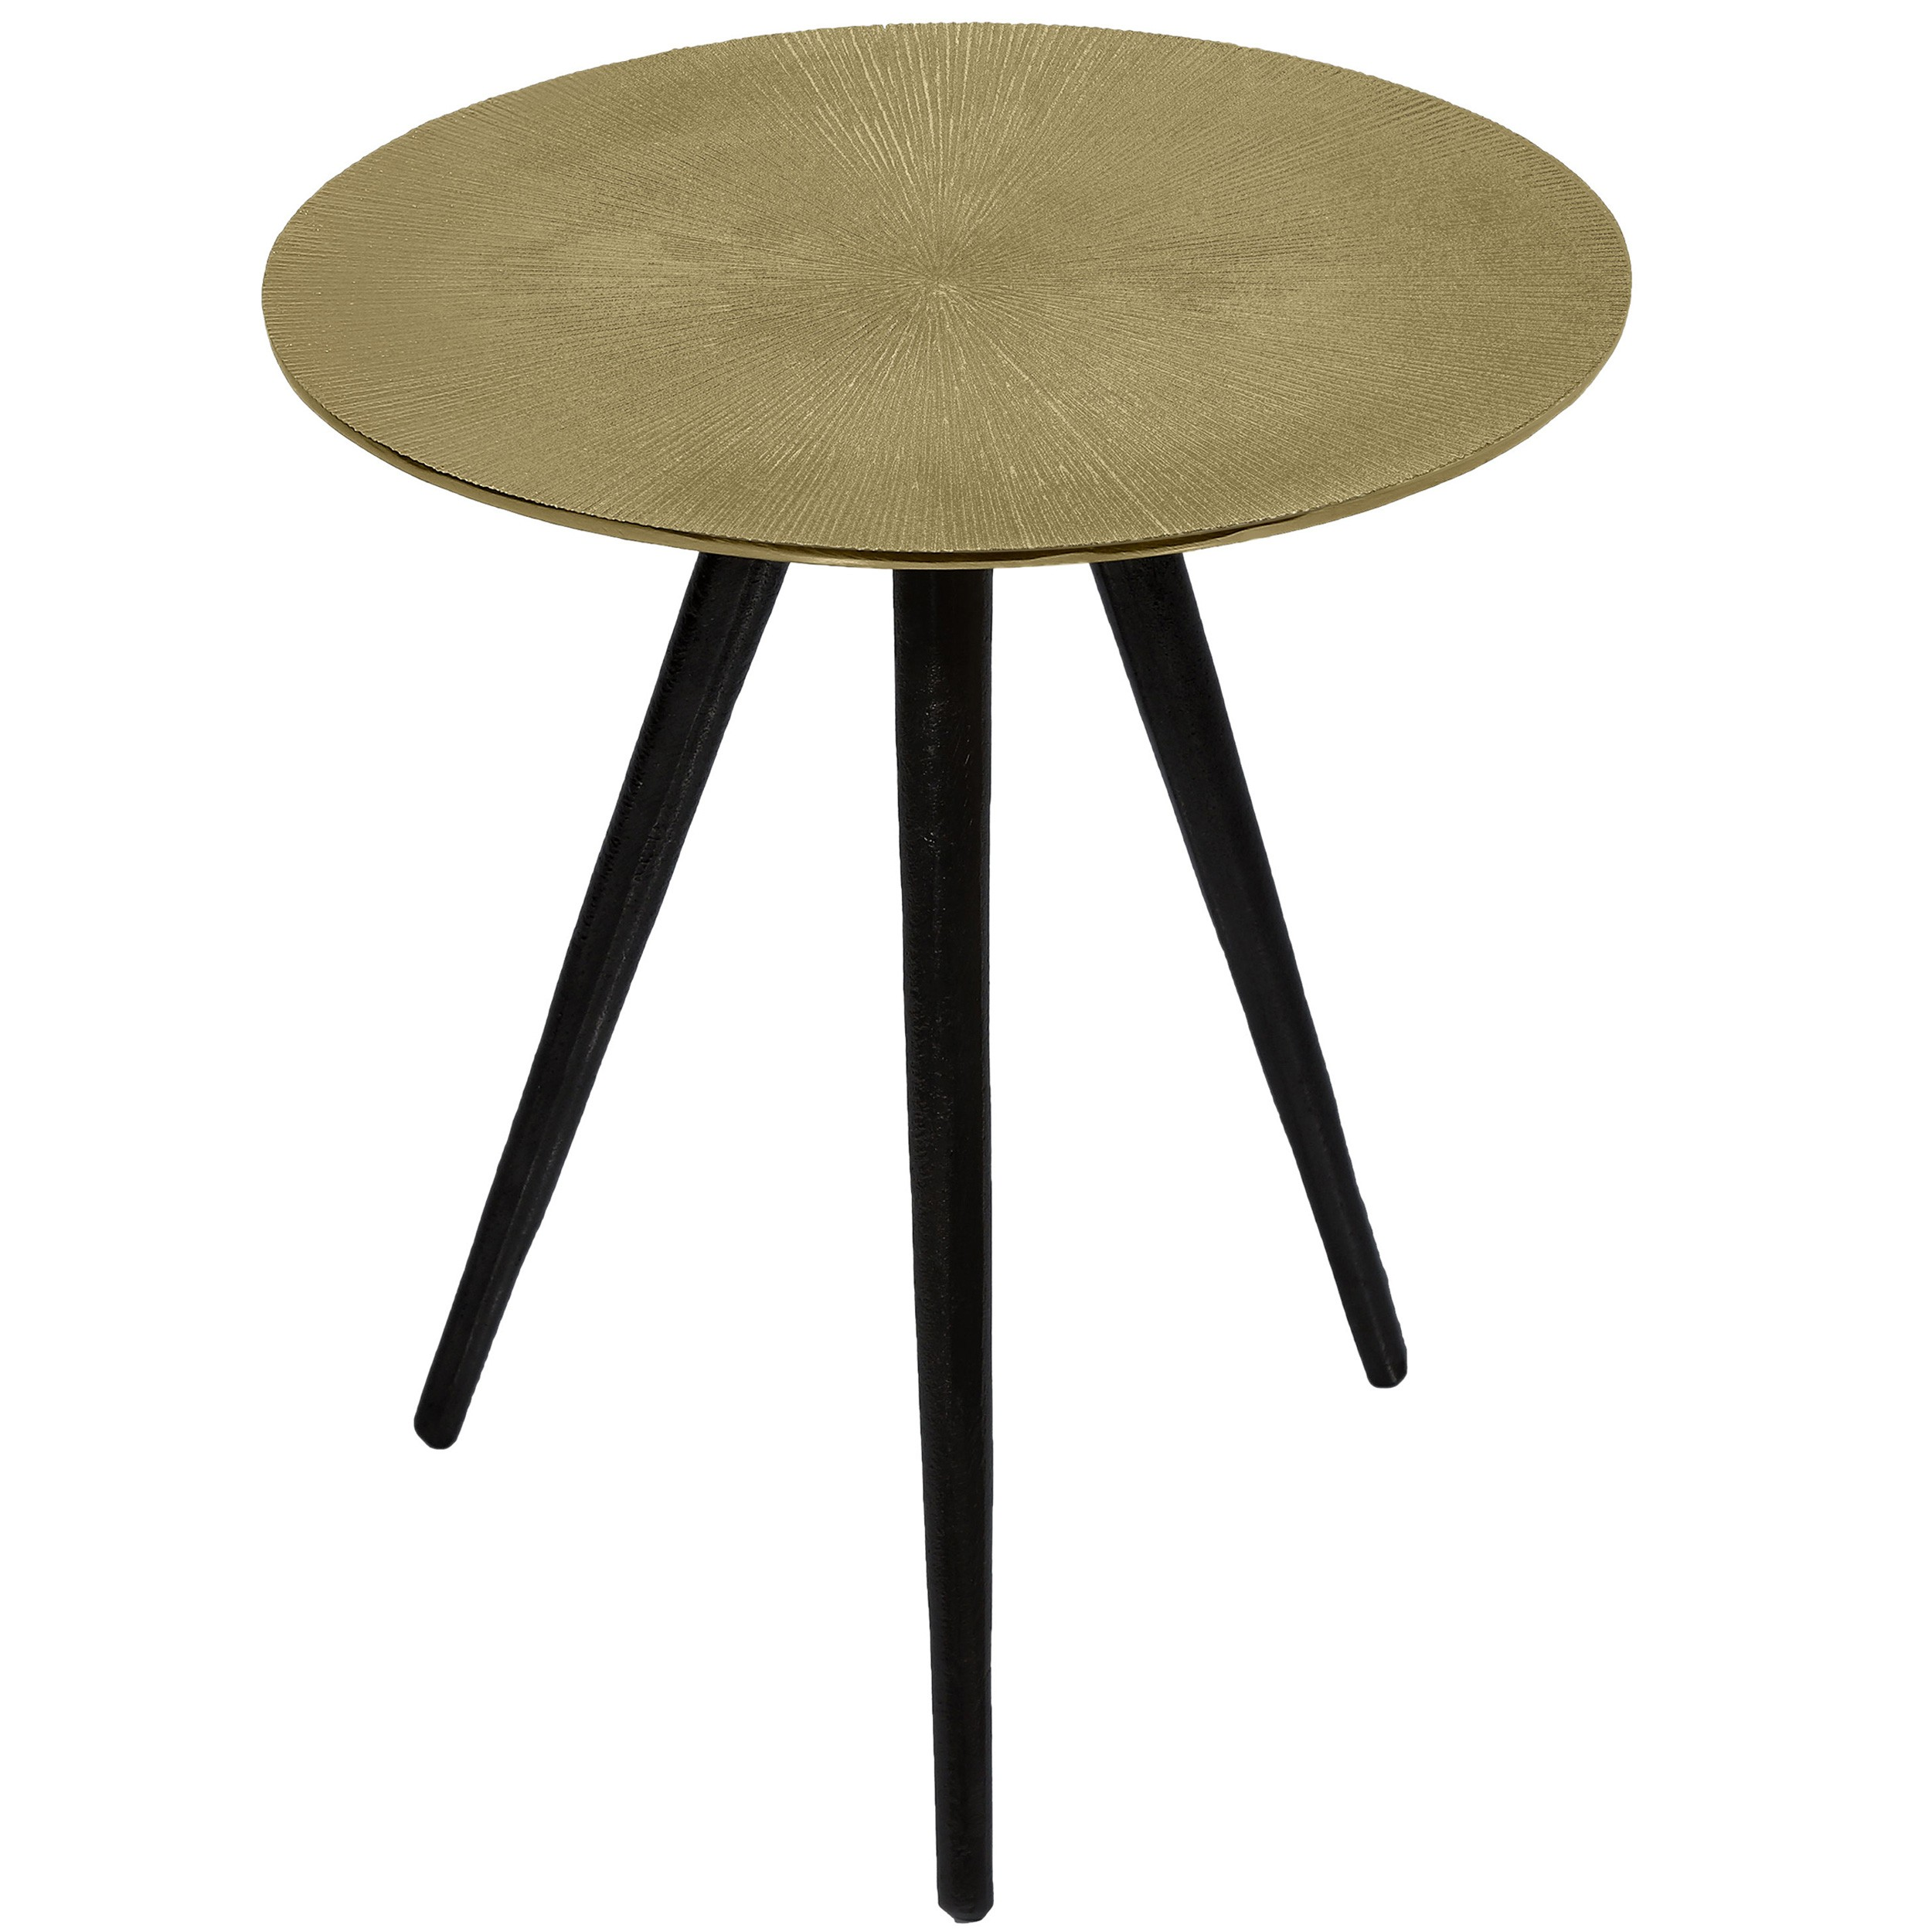 table basse ronde rivak laiton choisissez les tables basses rondes rivak laiton design rdv d co. Black Bedroom Furniture Sets. Home Design Ideas